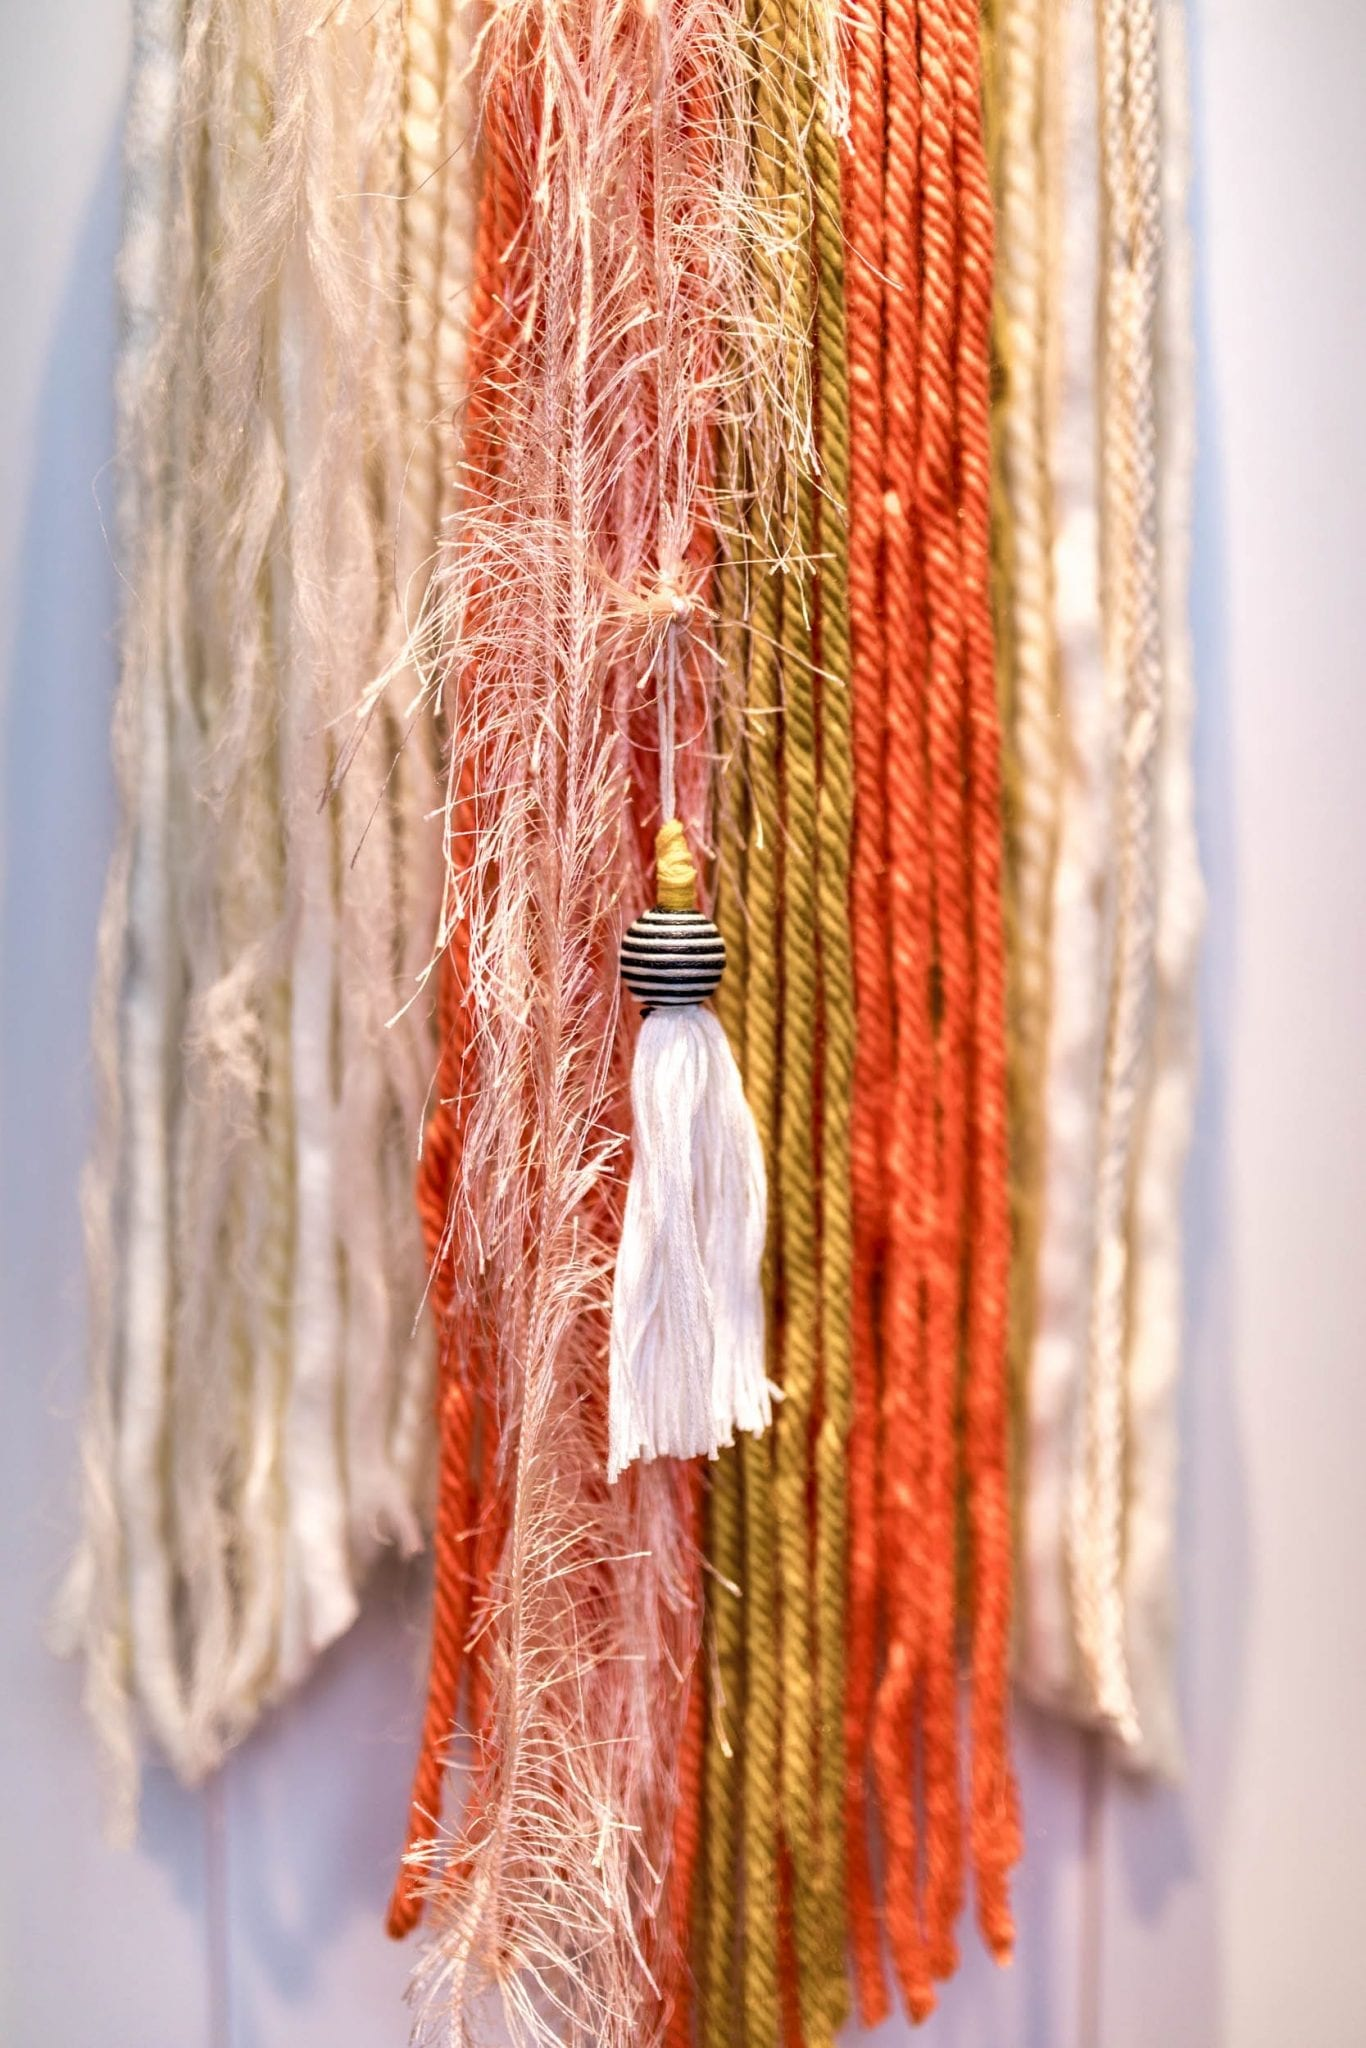 SUPER EASY Wall Hanging DIY | yarn wall hanging | Fringe Wall hanging | macrame wall hanging | macrame wall hanging diy | yarn wall hanging diy tutorials | Never Skip Brunch by Cara Newhart | #neverskipbrunch #DIY #decor #yarn #boho